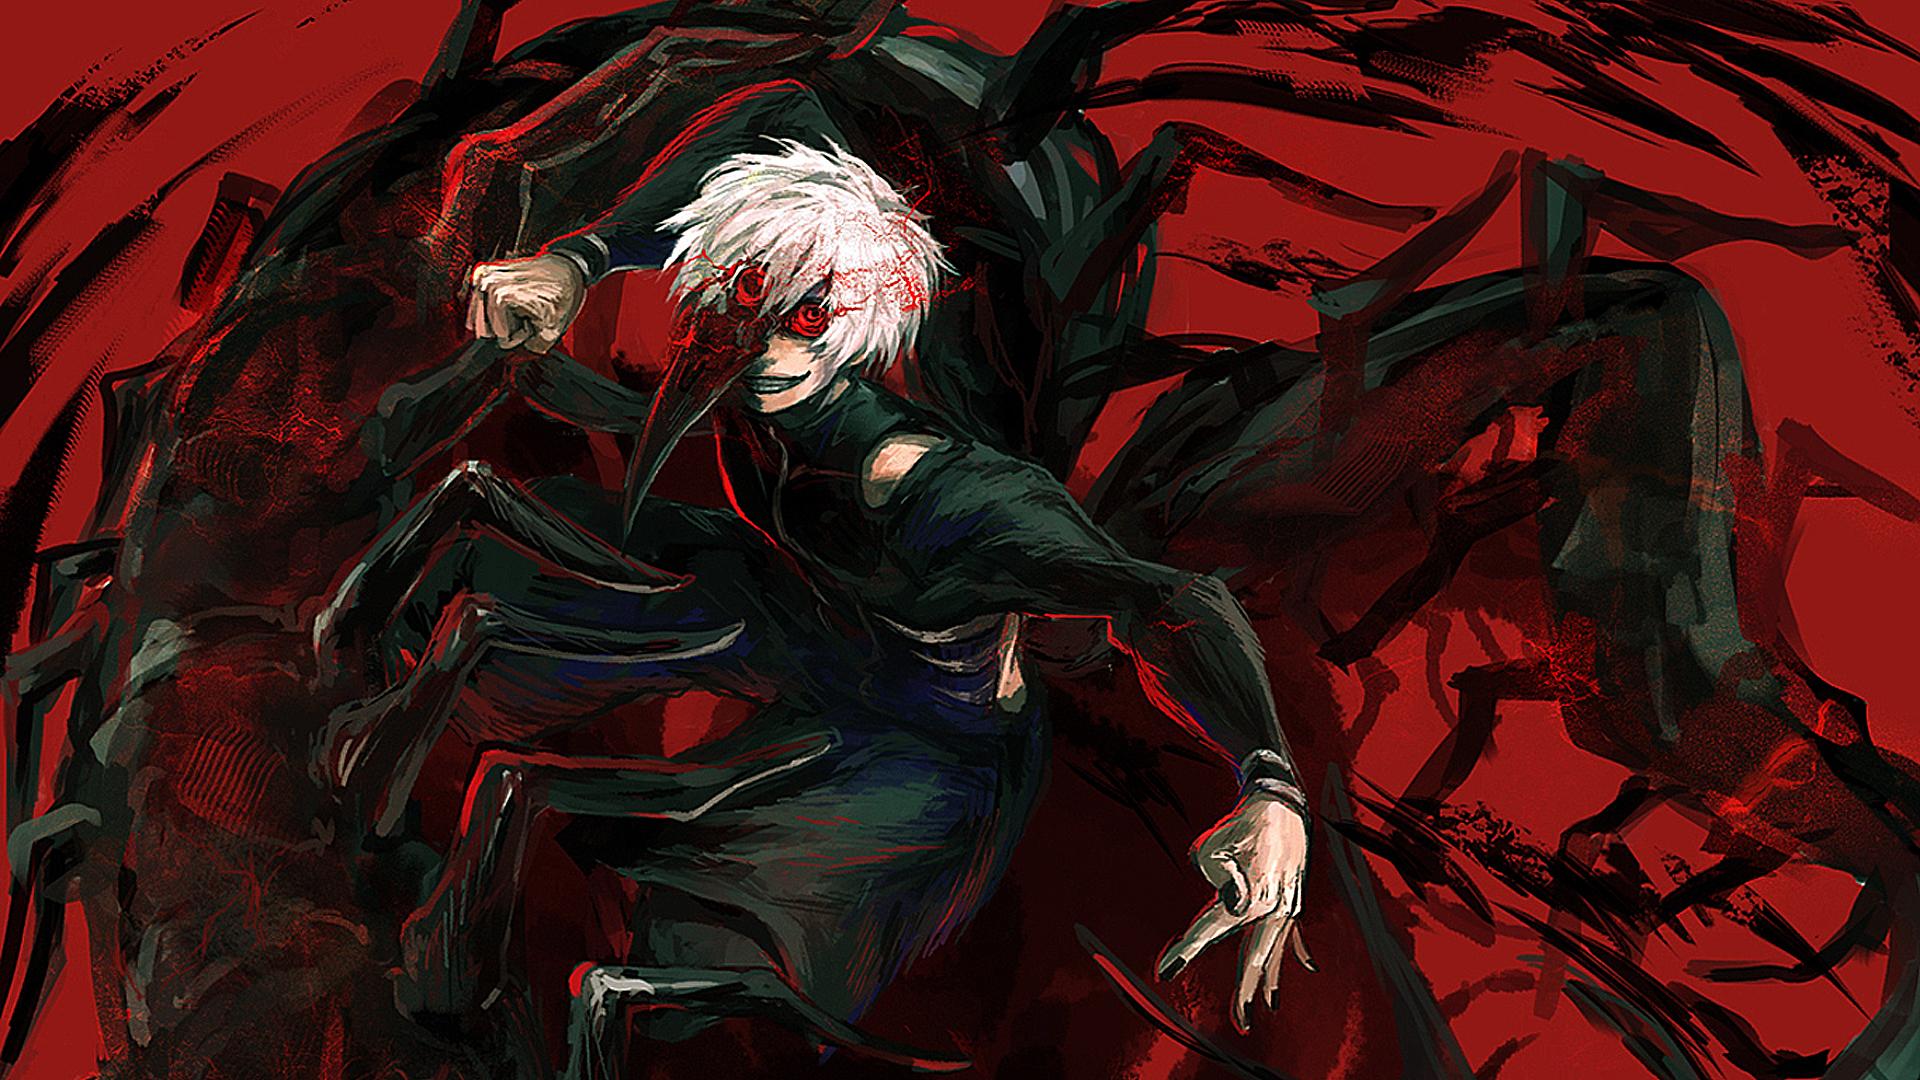 ken kaneki tokyo ghoul anime characters hd 1920x1080 1080p and 1920x1080